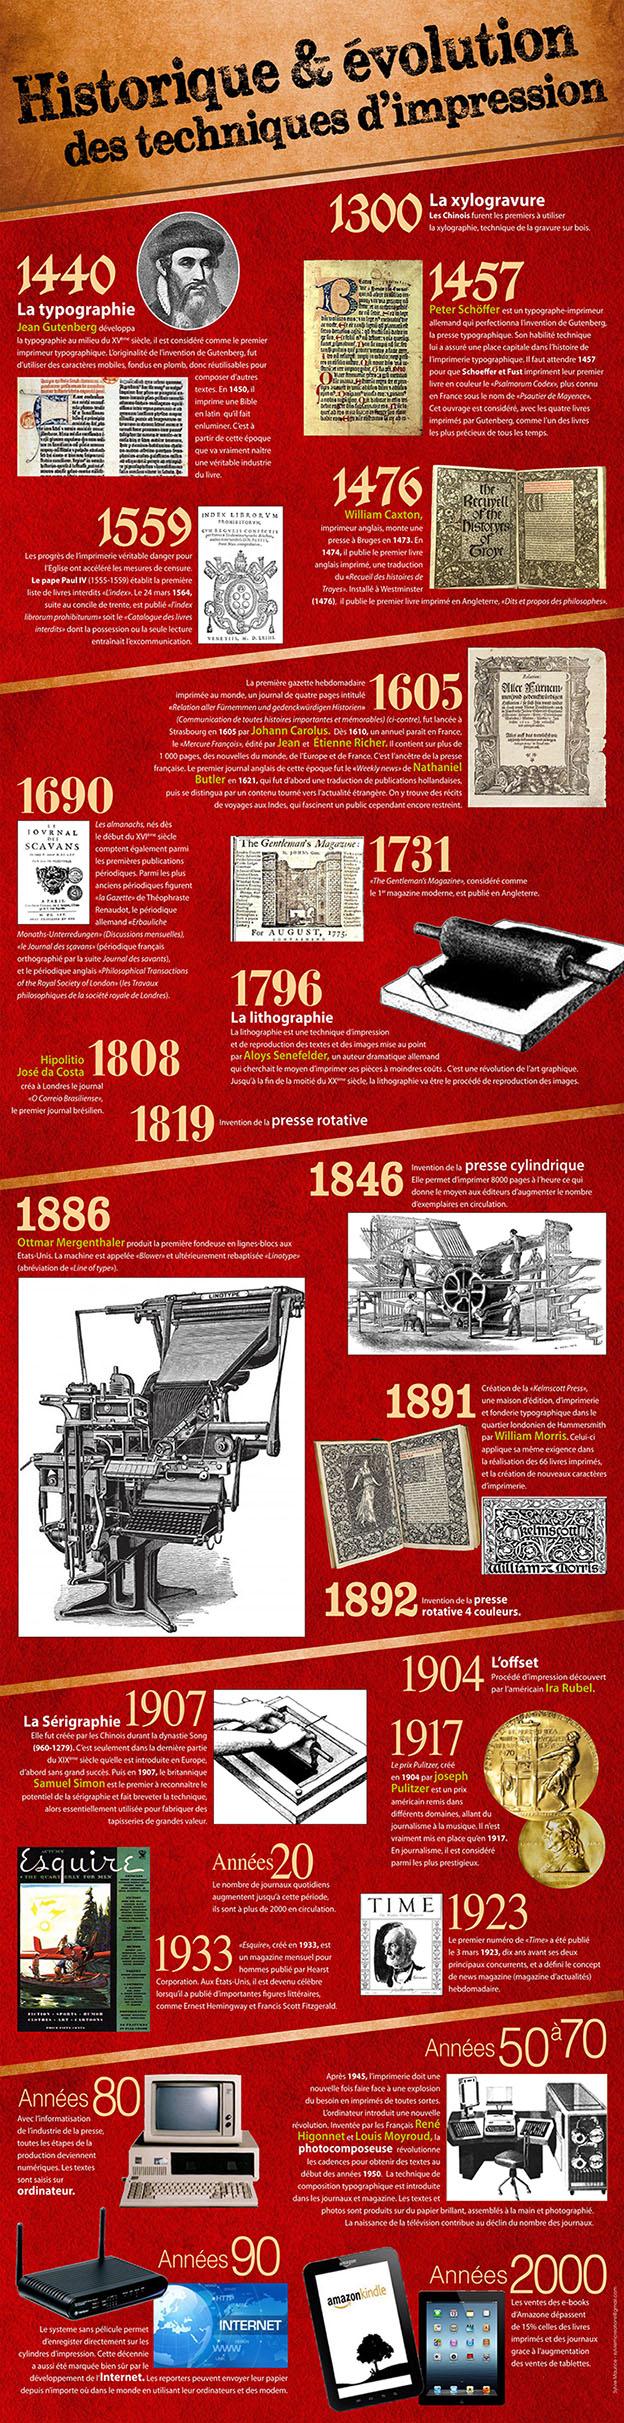 InfographiePresse02ok